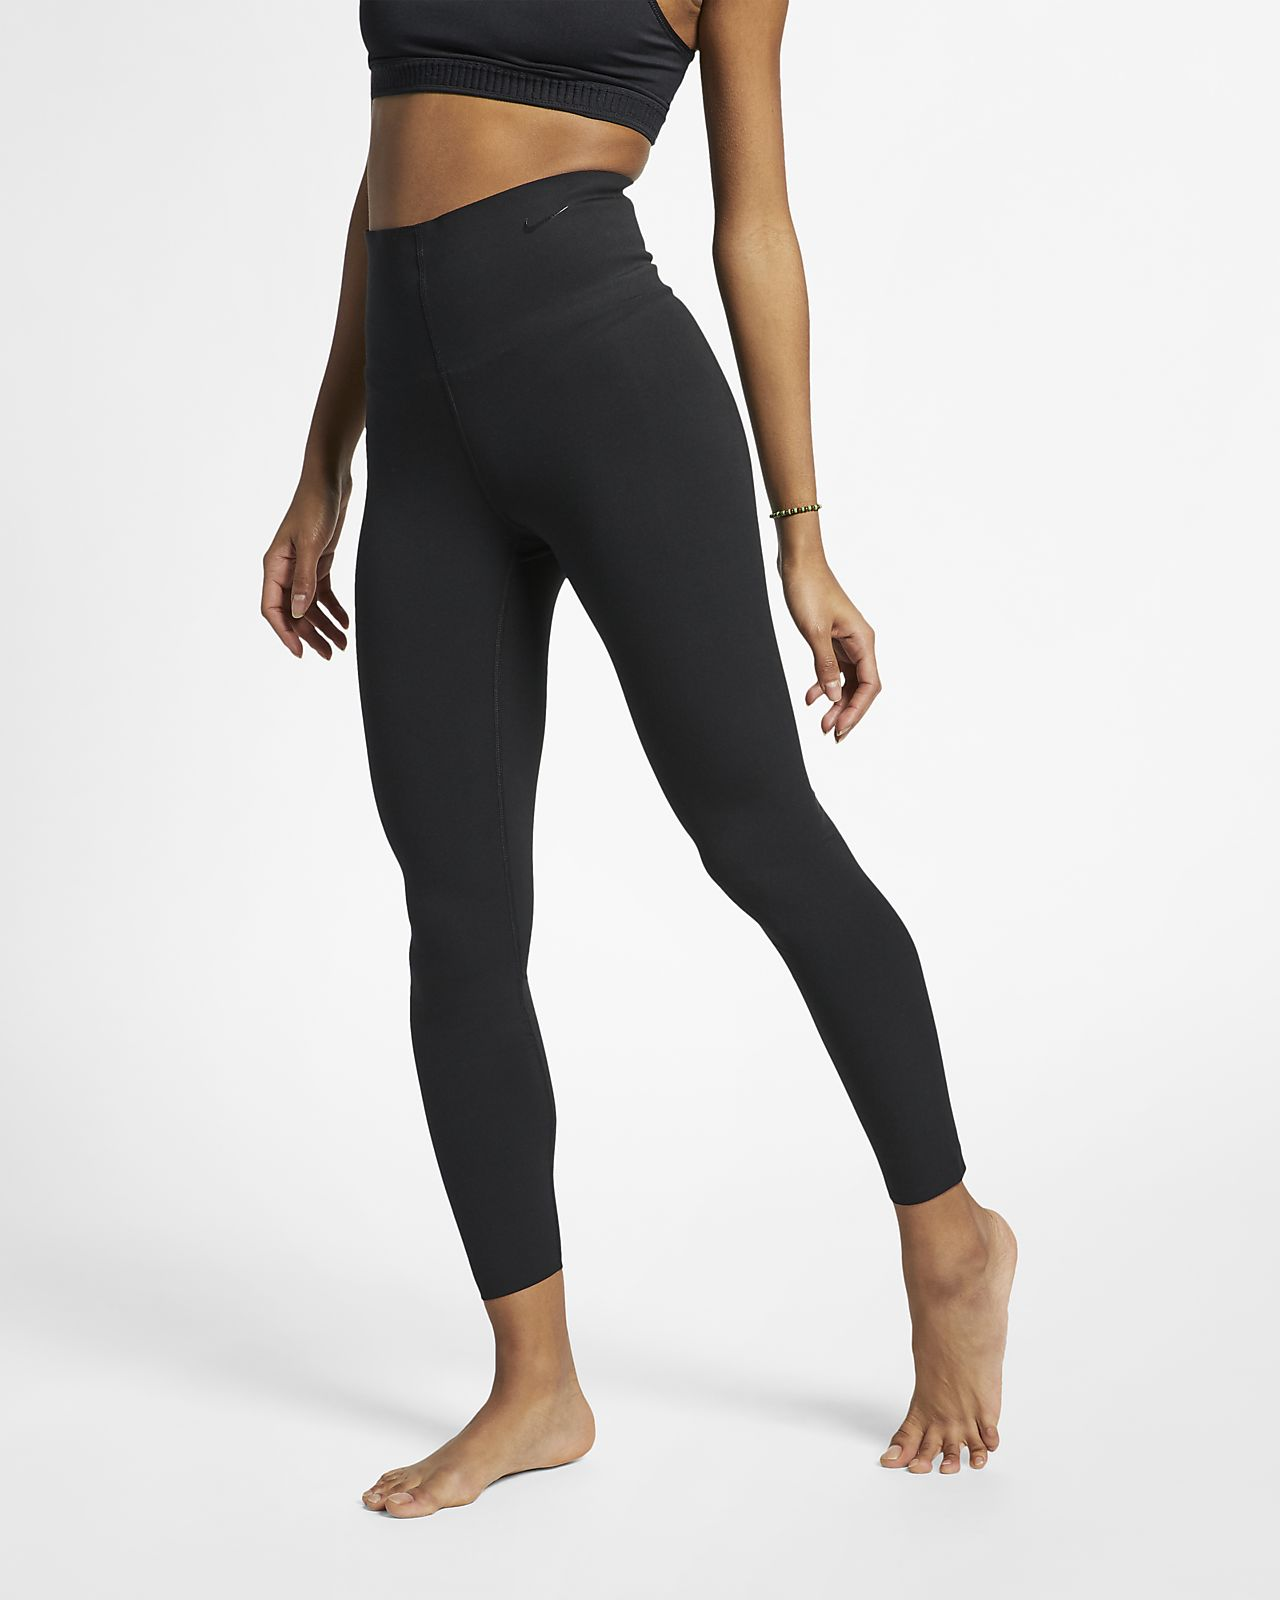 ef1c4f1ec380c Nike Sculpt Lux Women's 7/8 Yoga Tights. Nike.com BG